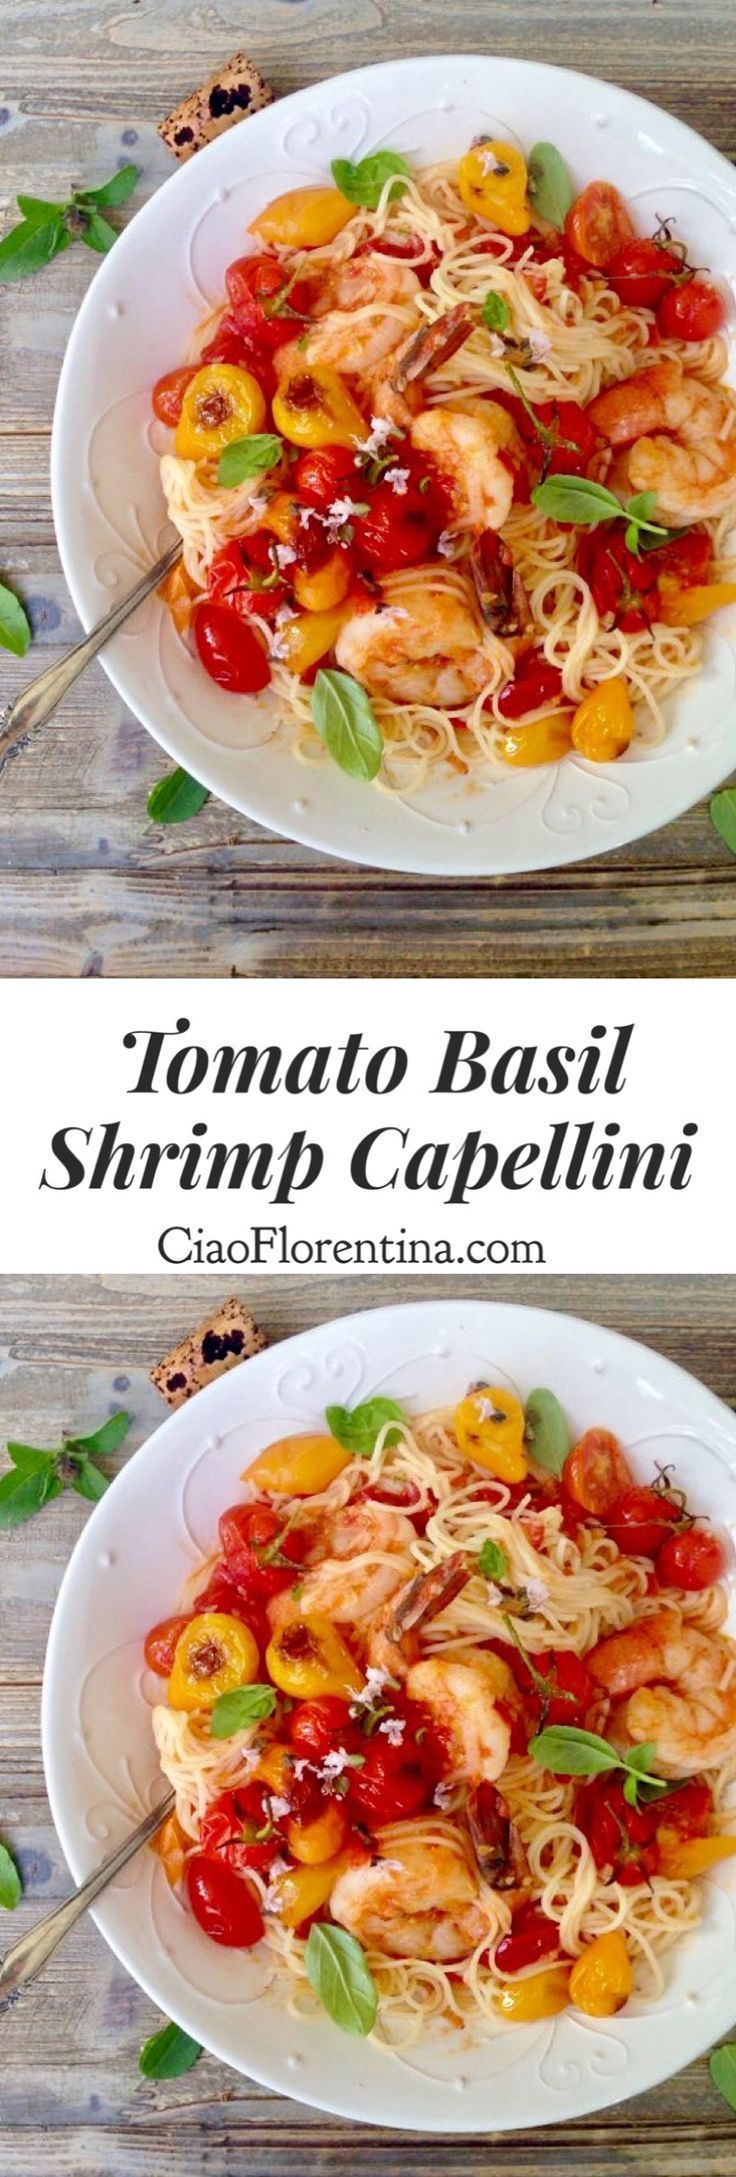 Fresh Tomato Basil Sauce with Garlic Shrimp Capellini Pasta   CiaoFlorentina.com @CiaoFlorentina